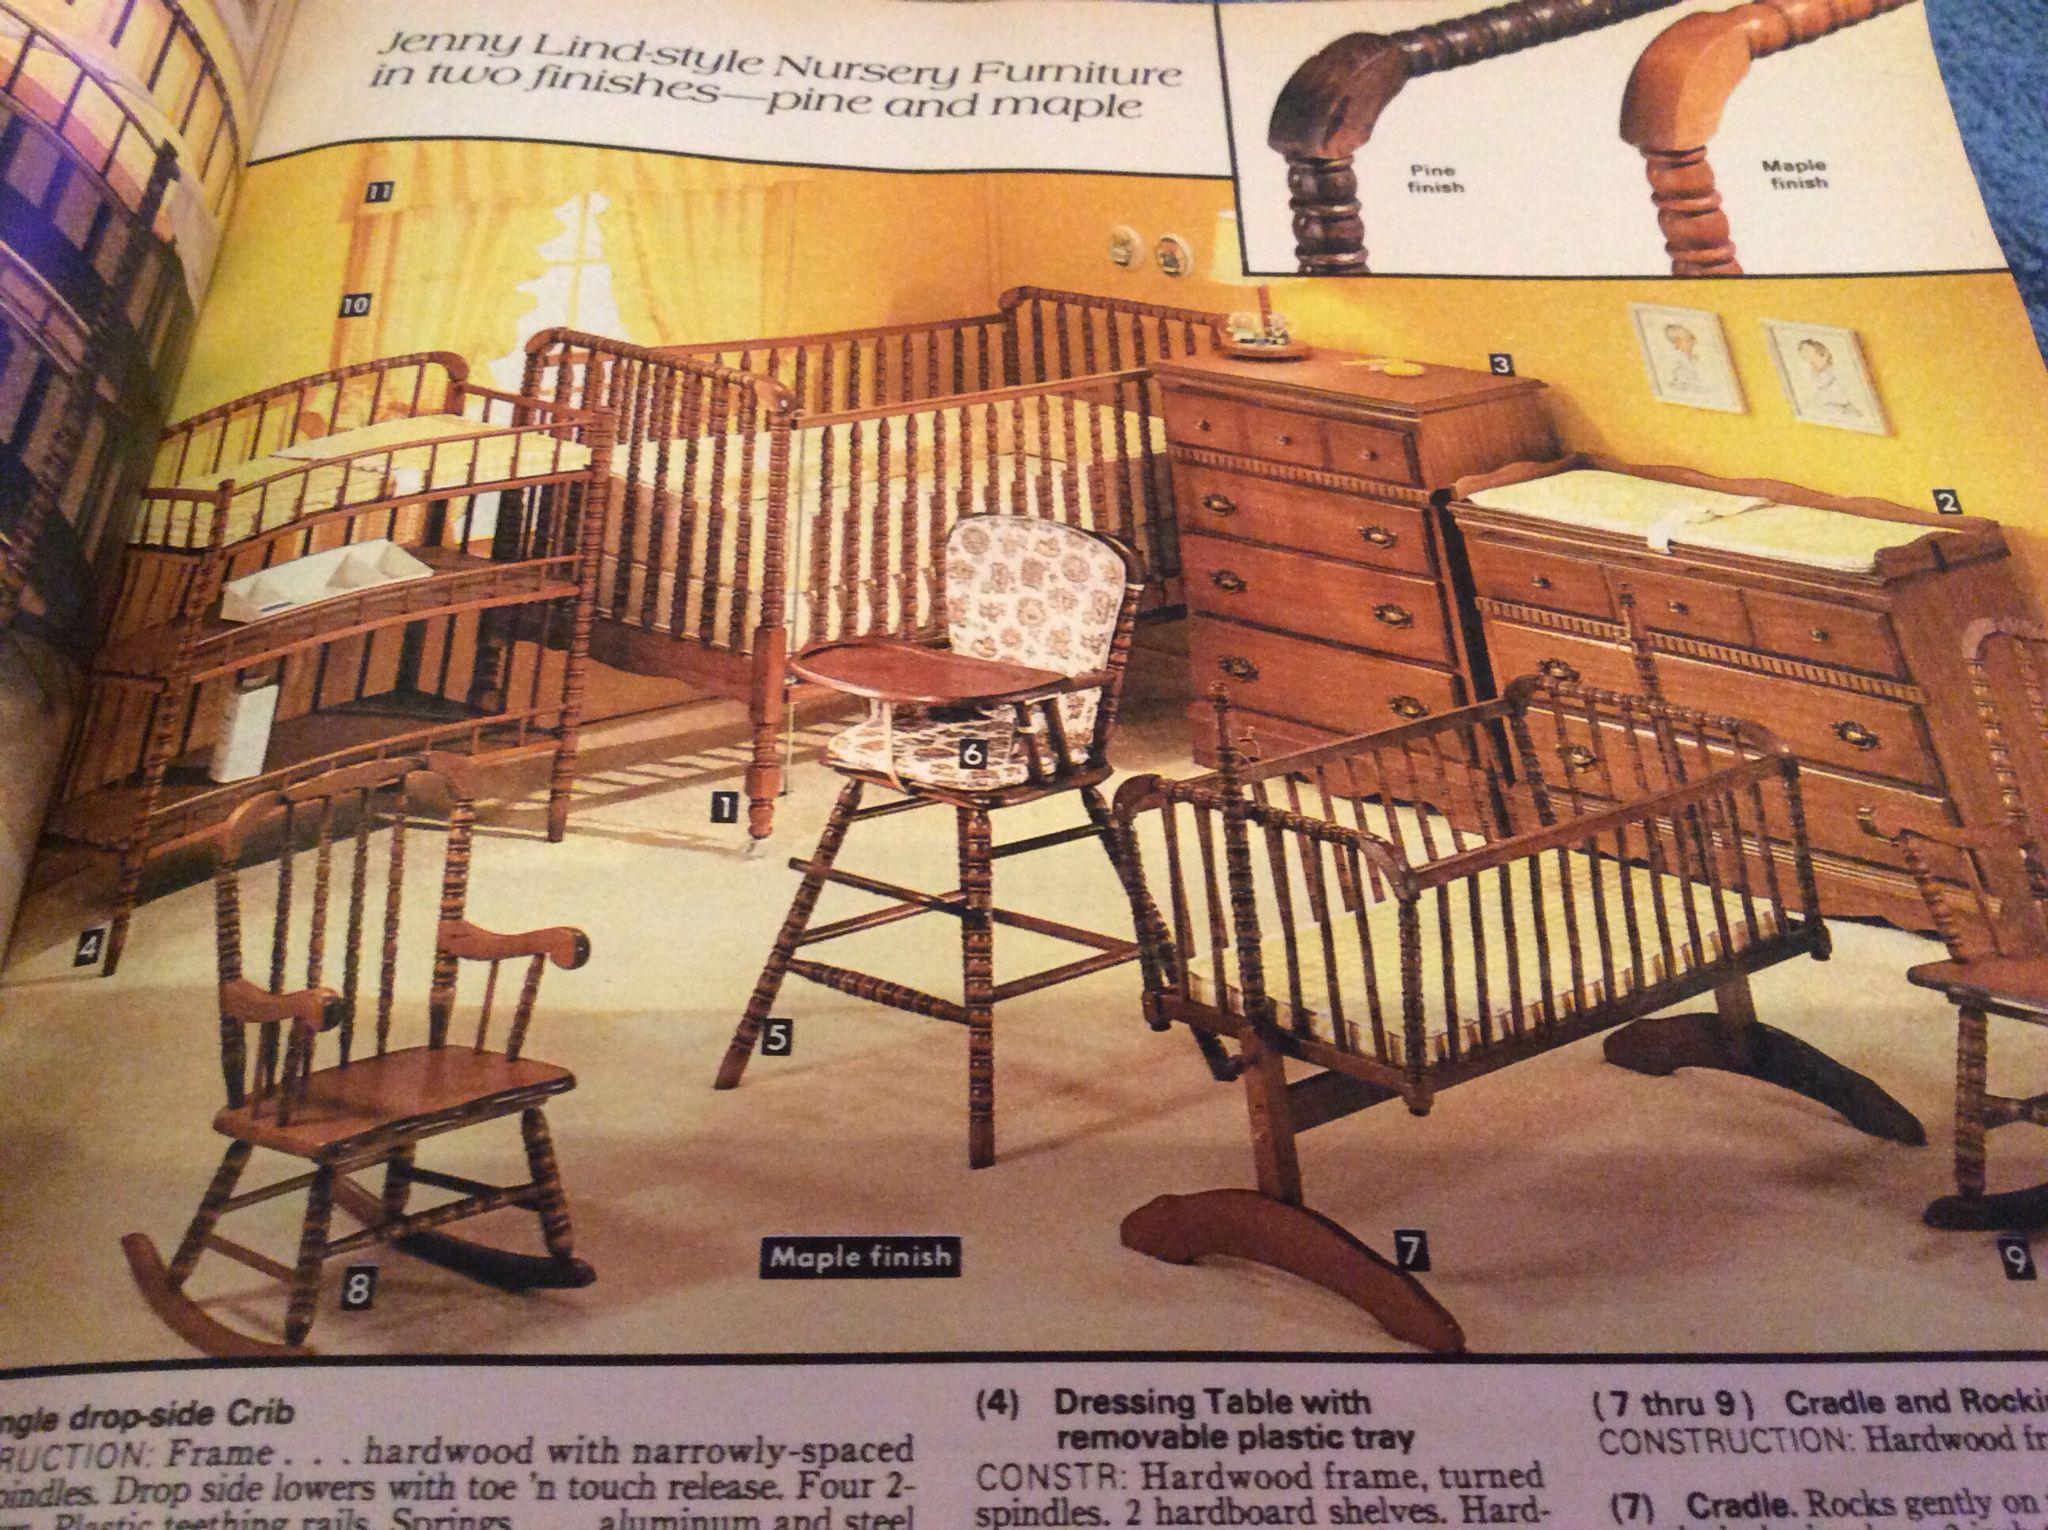 1980 Sears Catalog Vintage Baby Vintage Baby Baby Furniture Pine Furniture Sears baby bedroom set